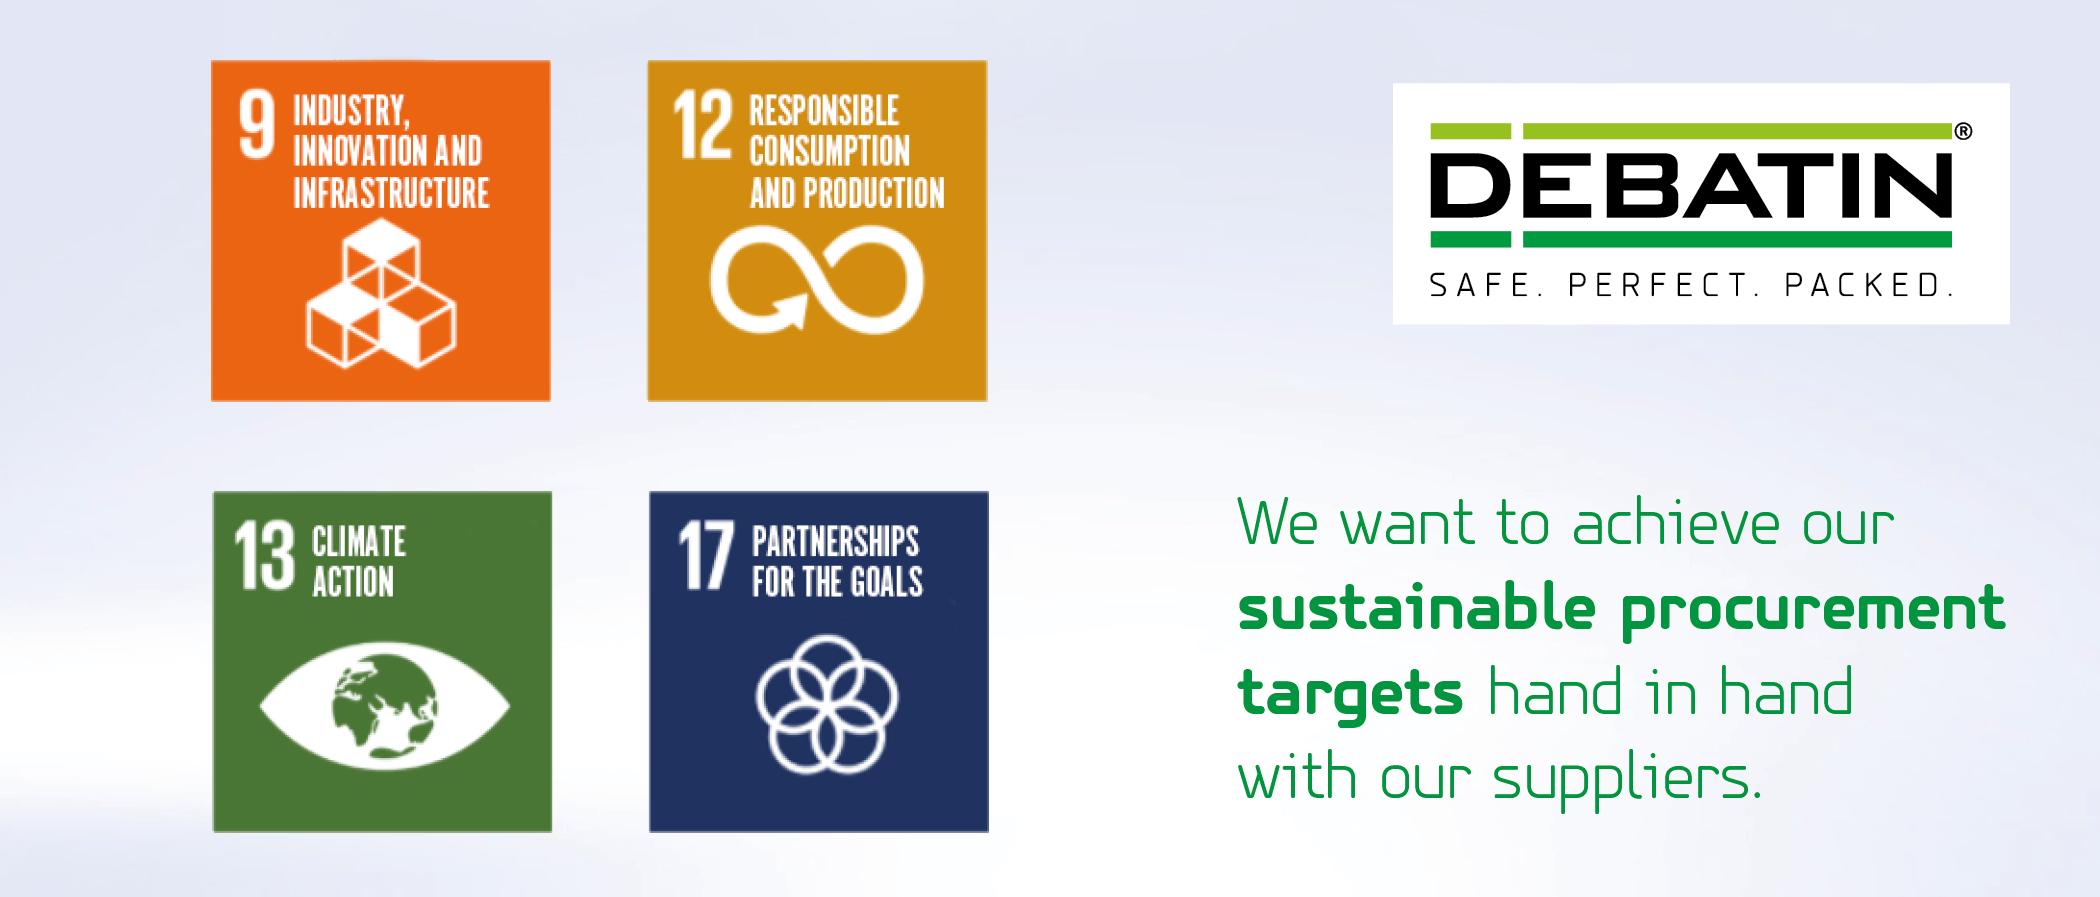 The DEBATIN sustainability strategy